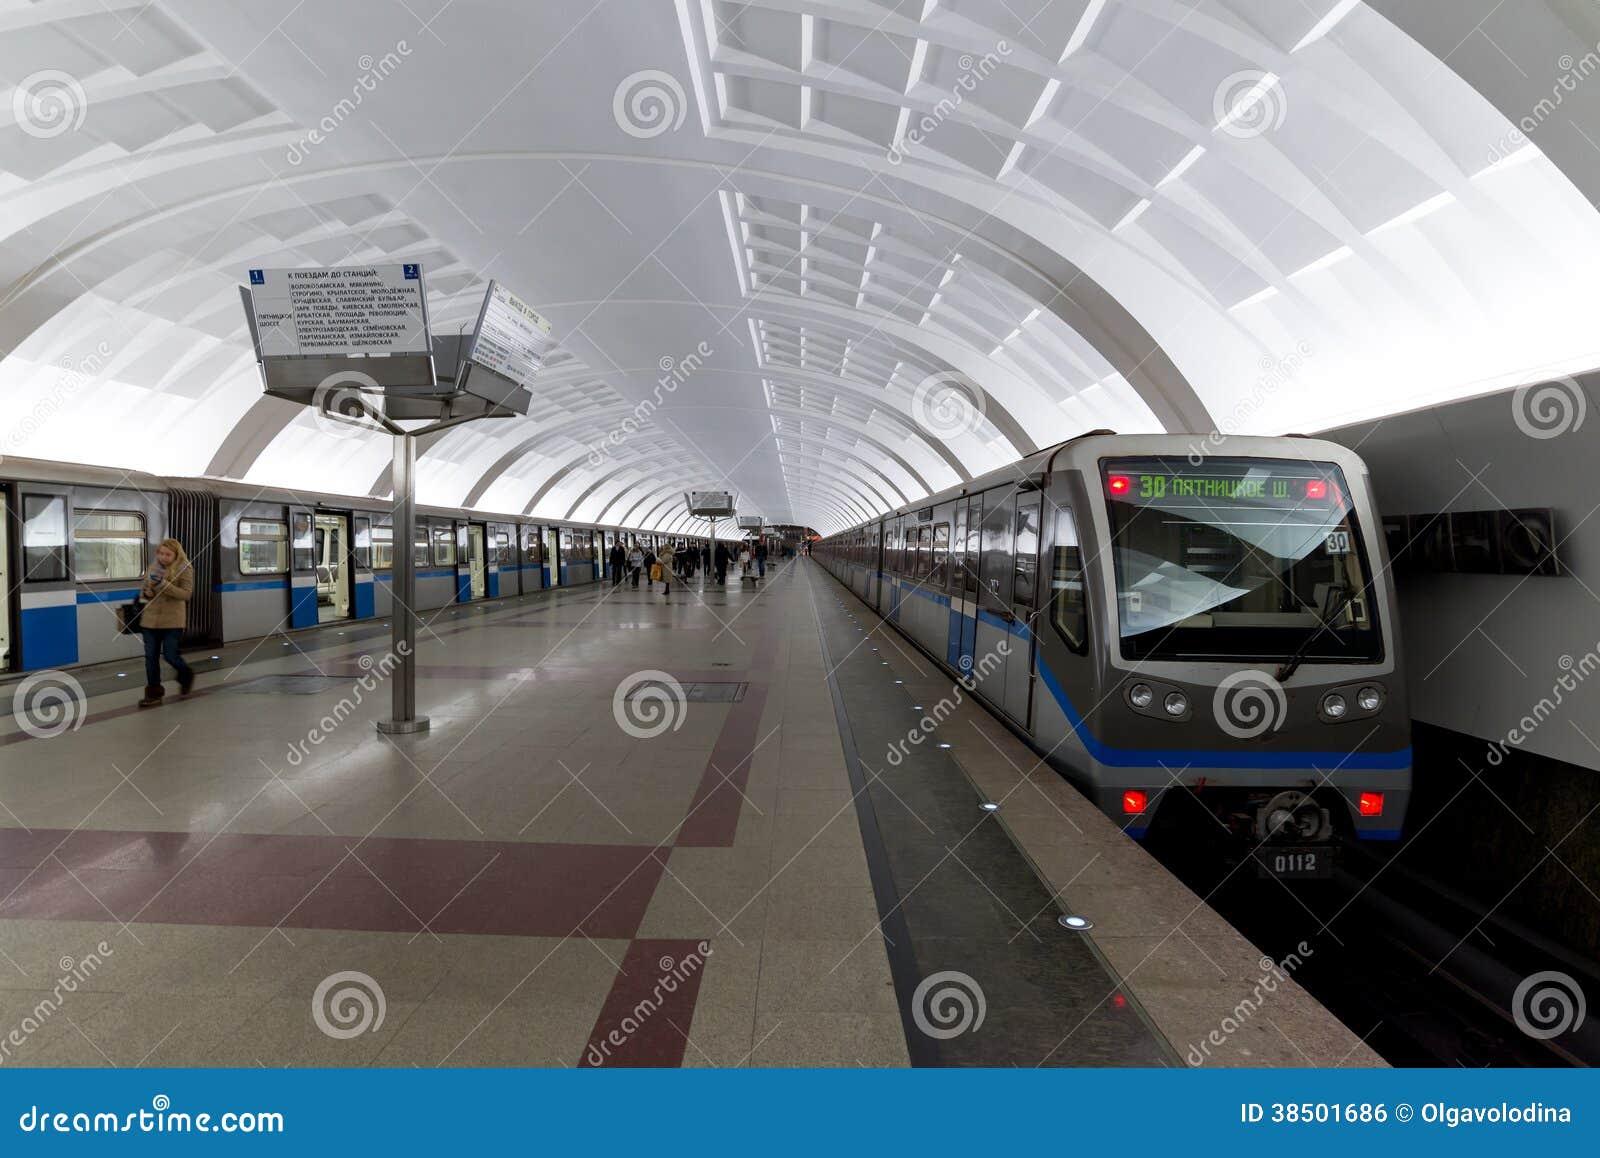 Metro Mitino. How to get to the subway Mitino (Moscow) 22